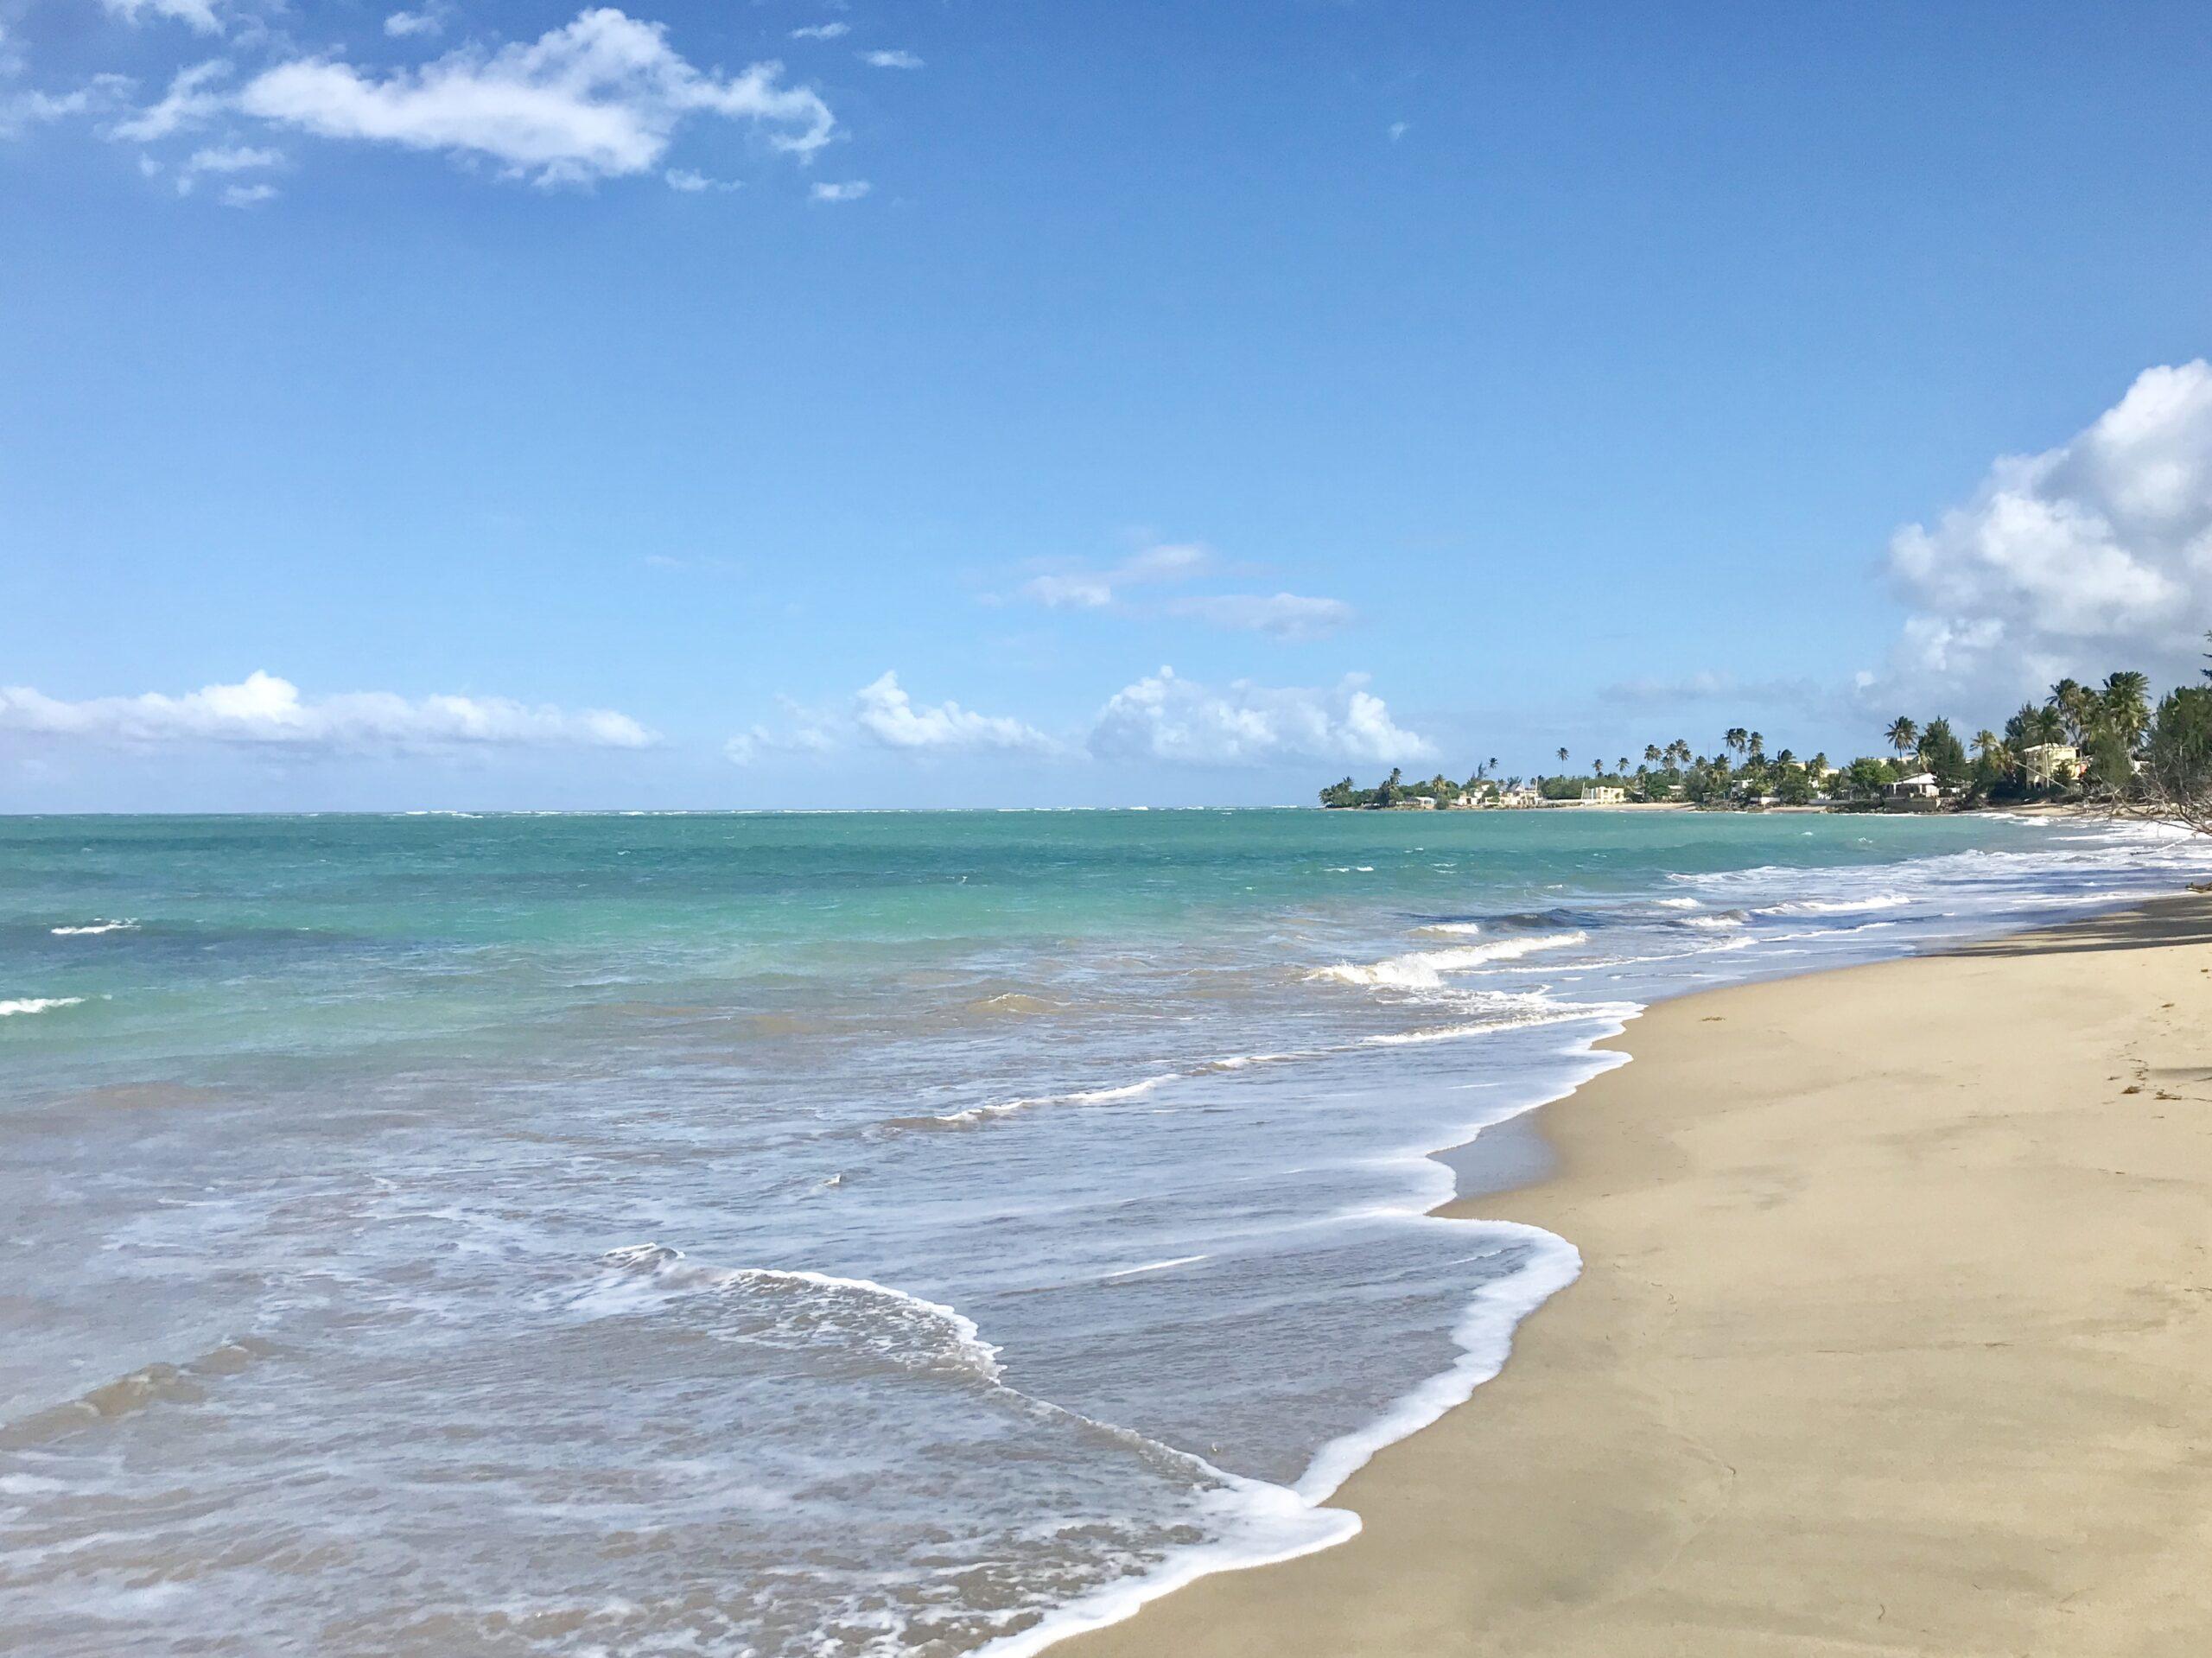 beach in puerto rico